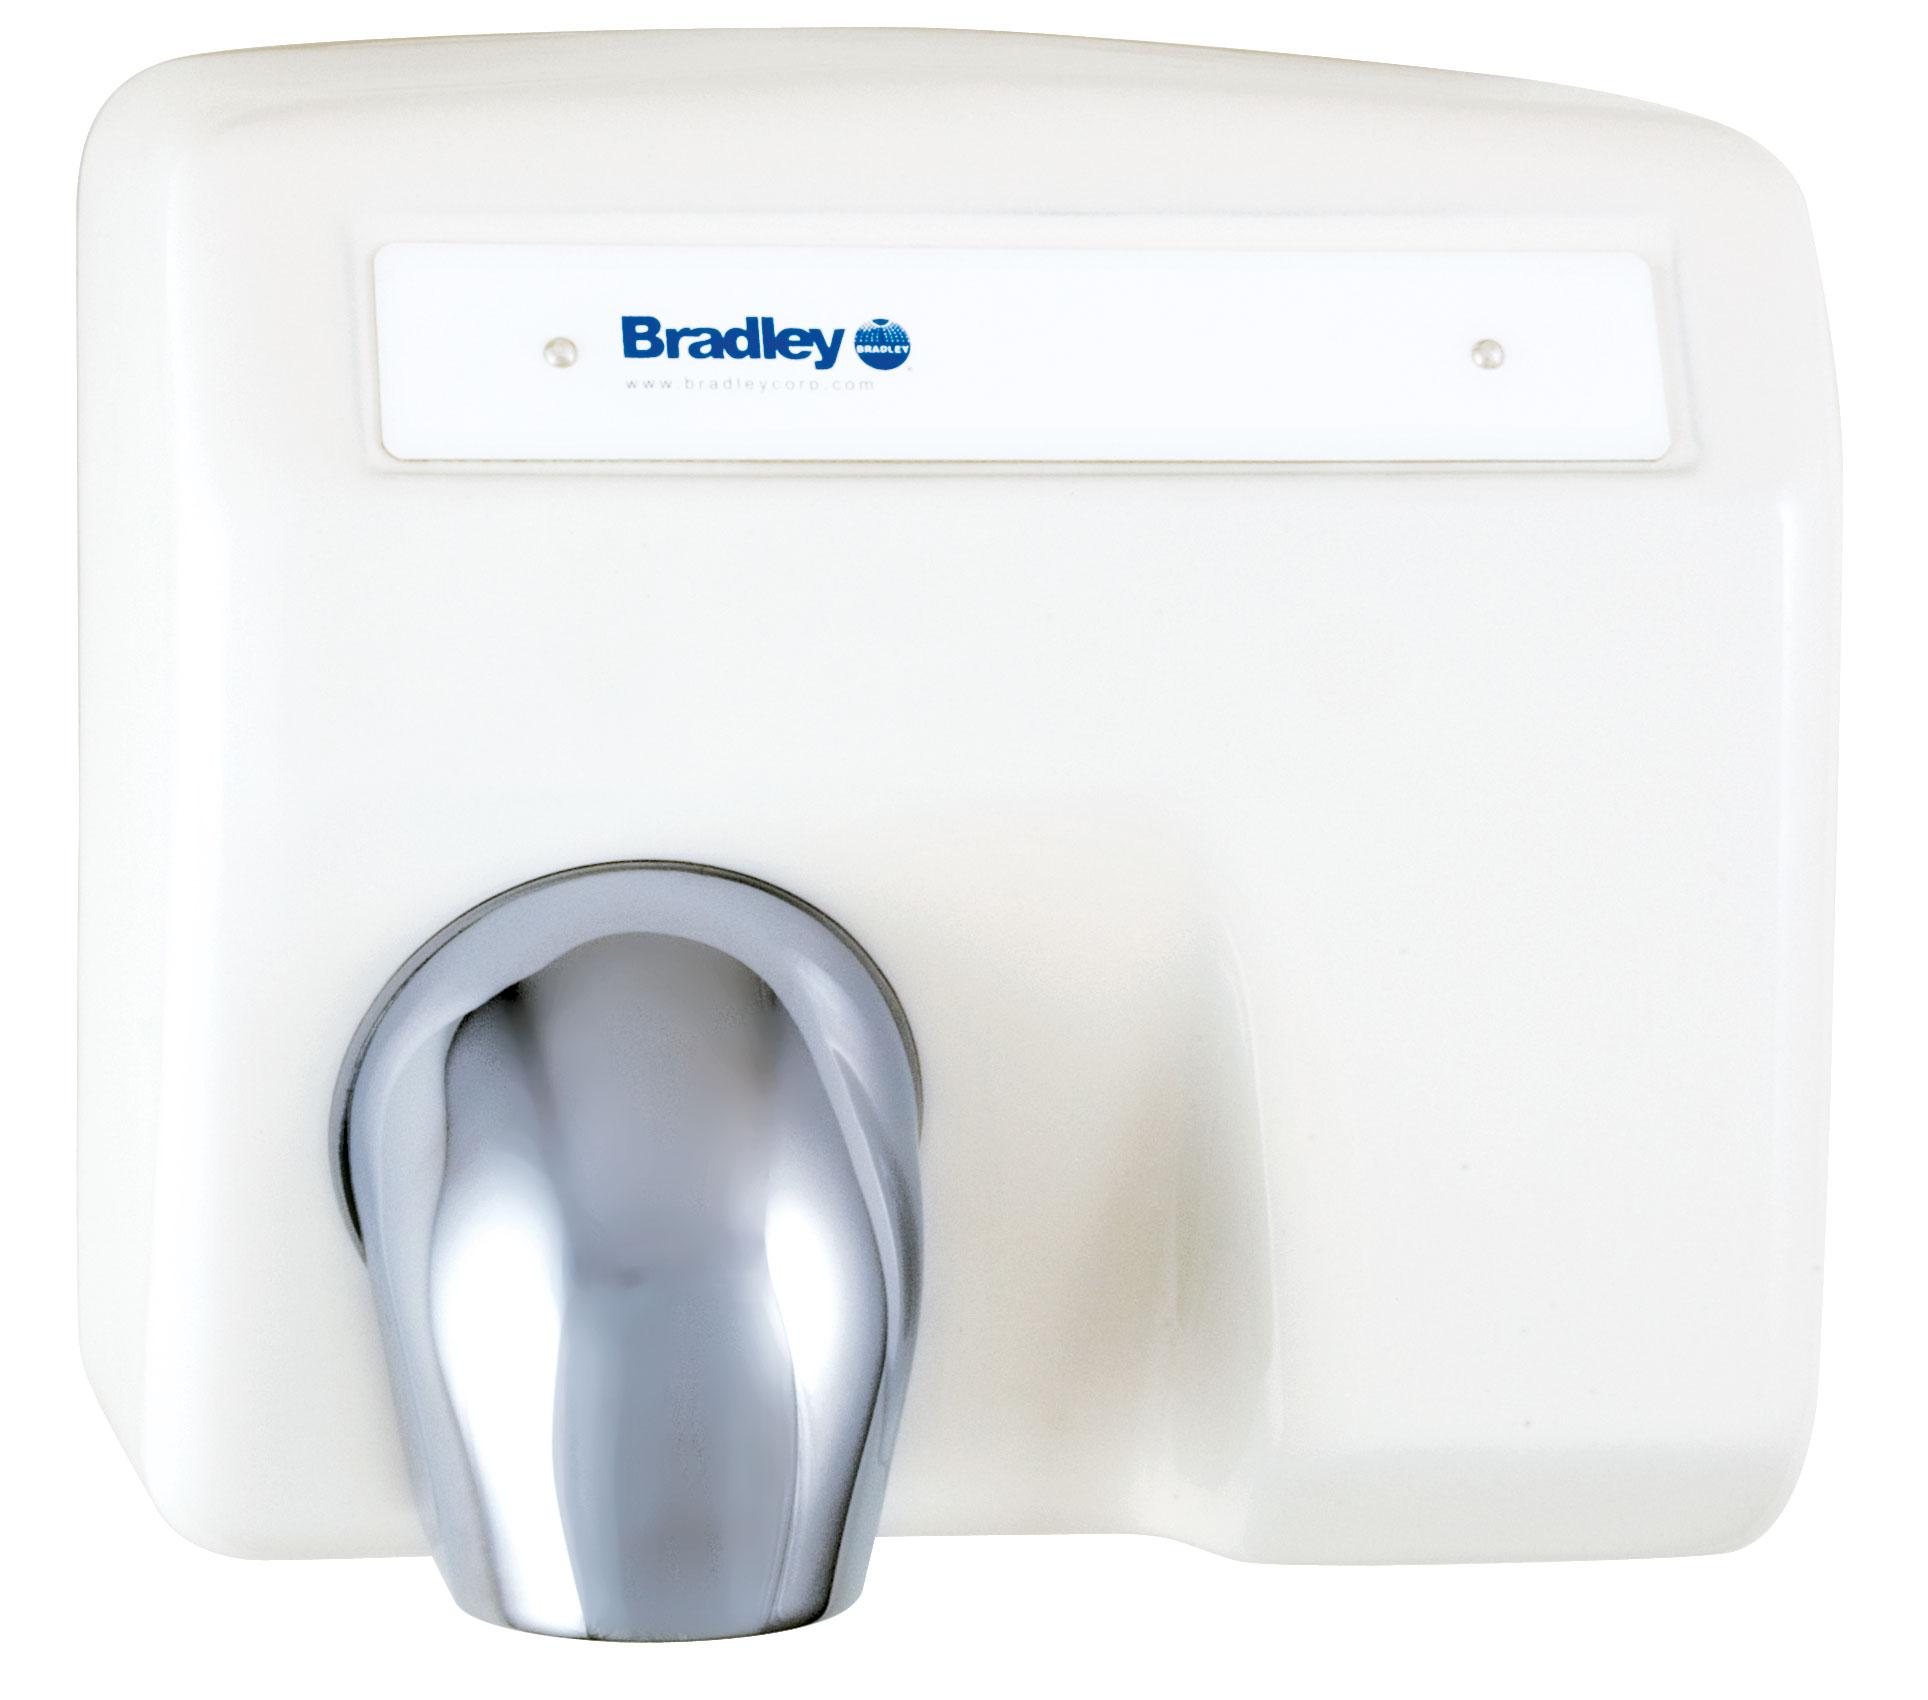 Aerix Sensor Operated Hand Dryer Bradley Corporation